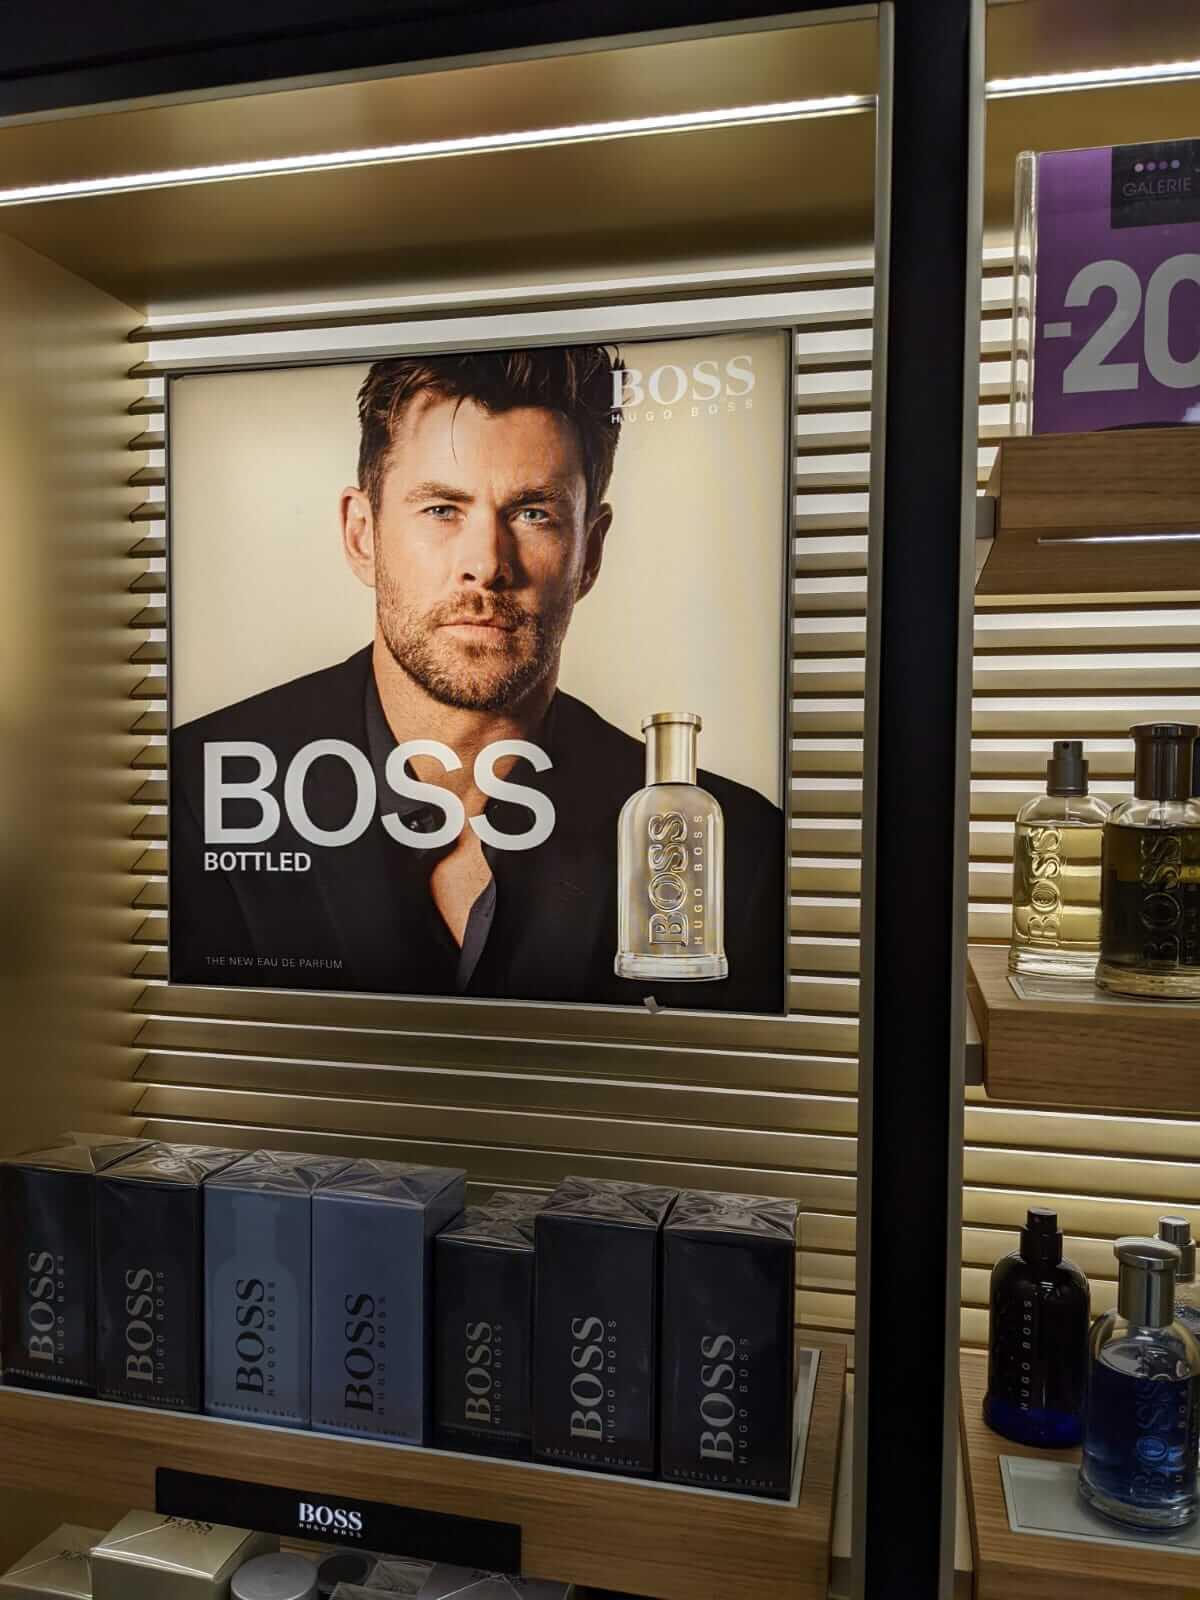 Boss lightbox close up